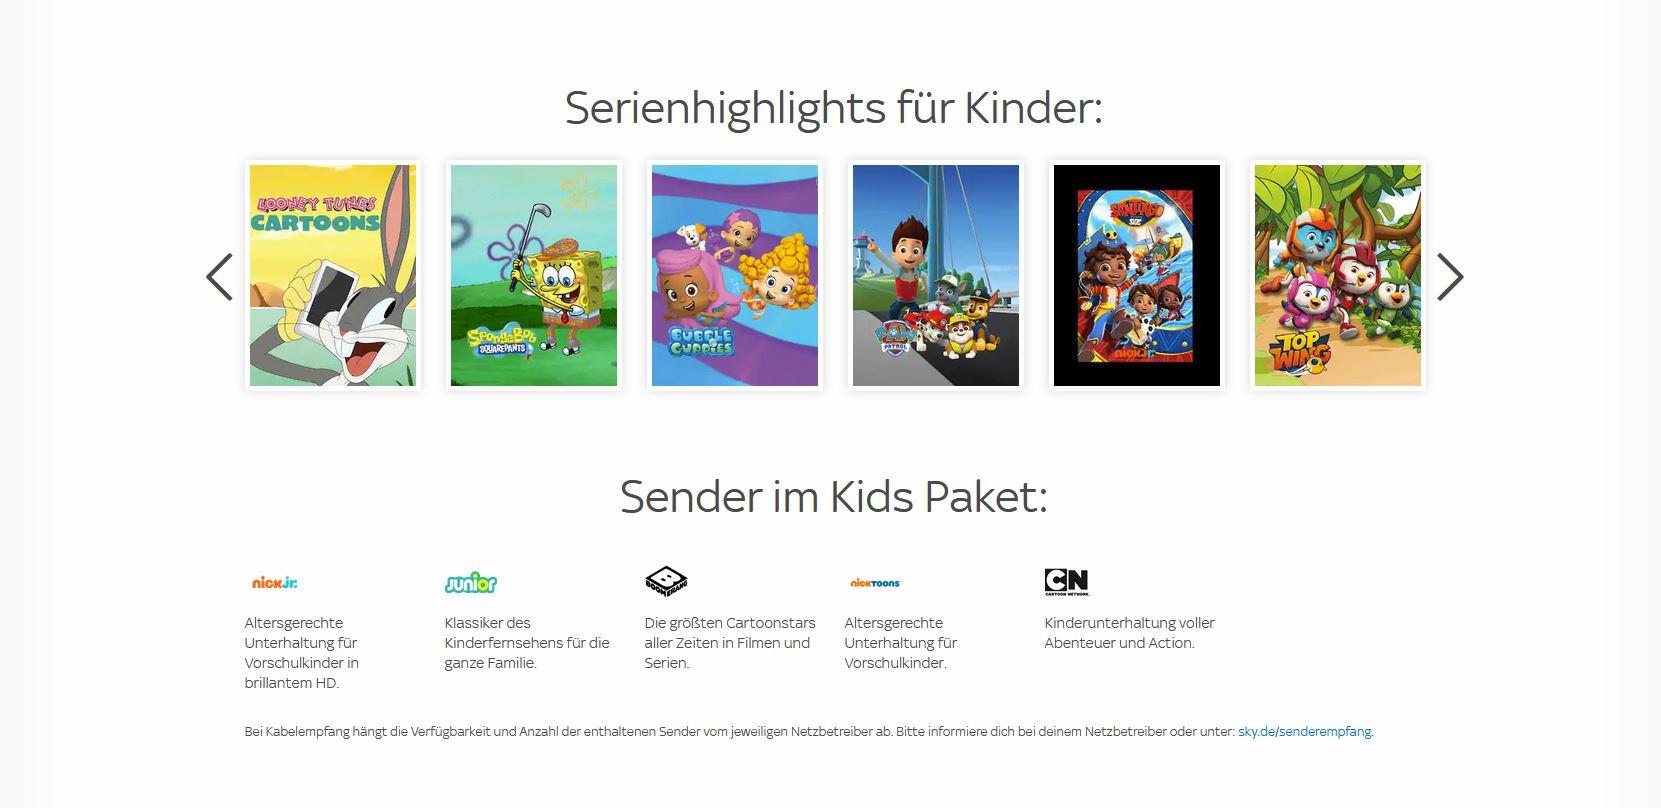 sky-kids-paket-startseite